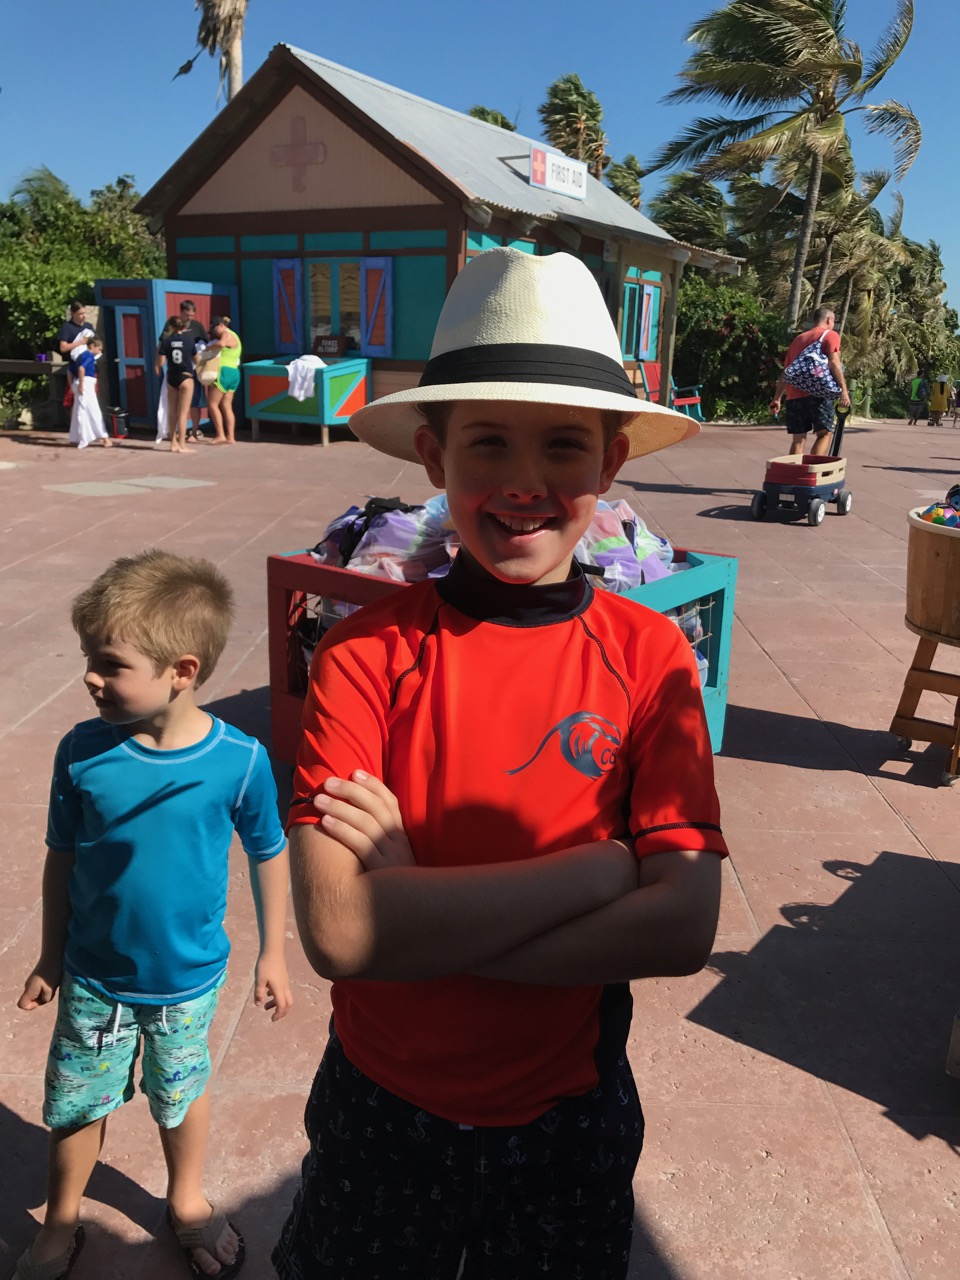 Disney Dream Castaway Cay Shopping